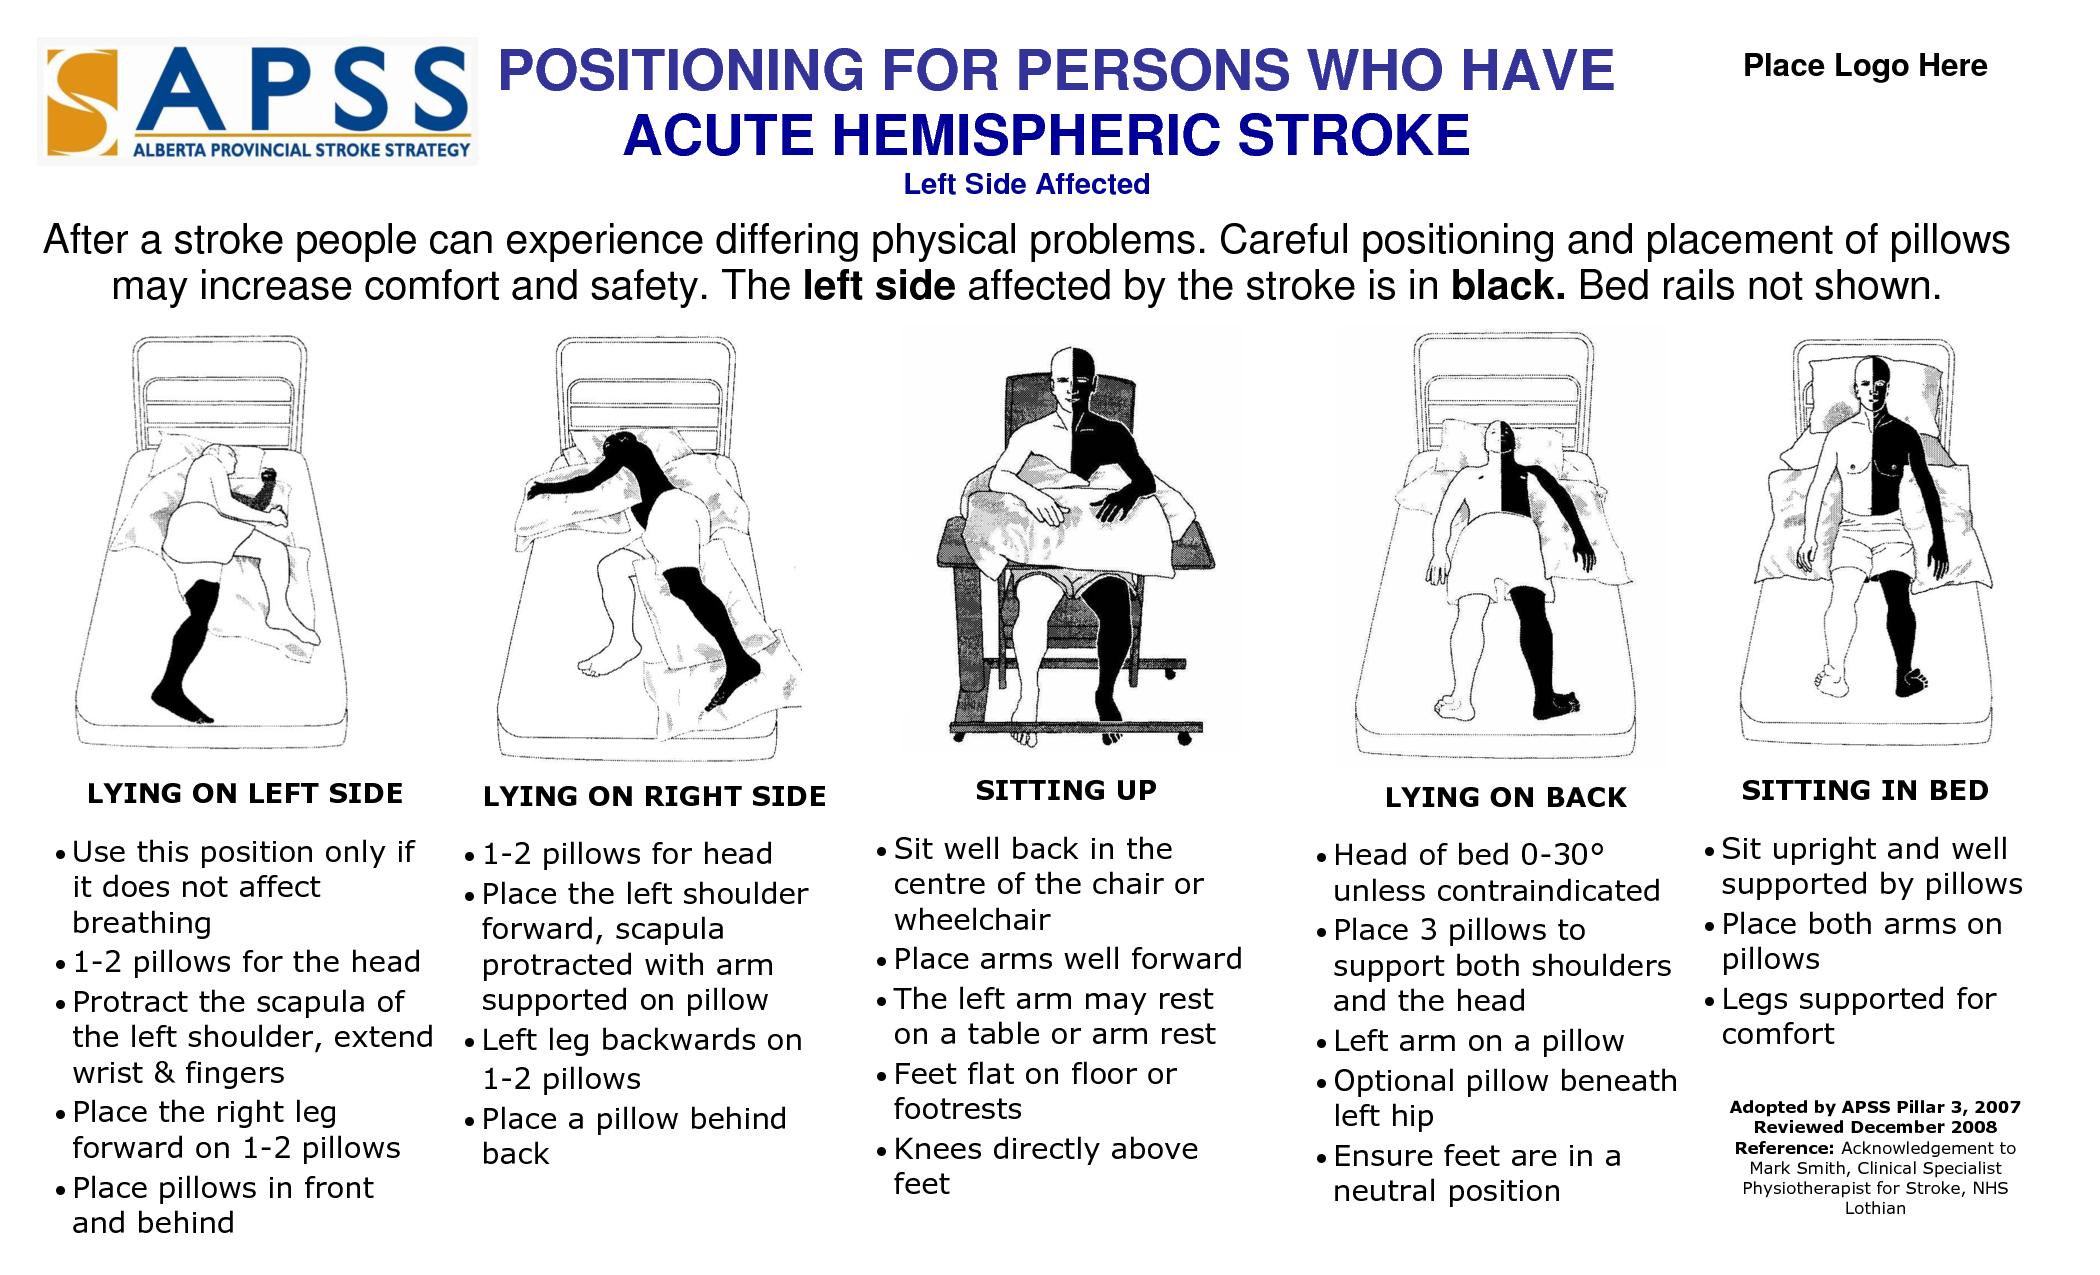 Stroke Patient Positioning Poster (eft side affects